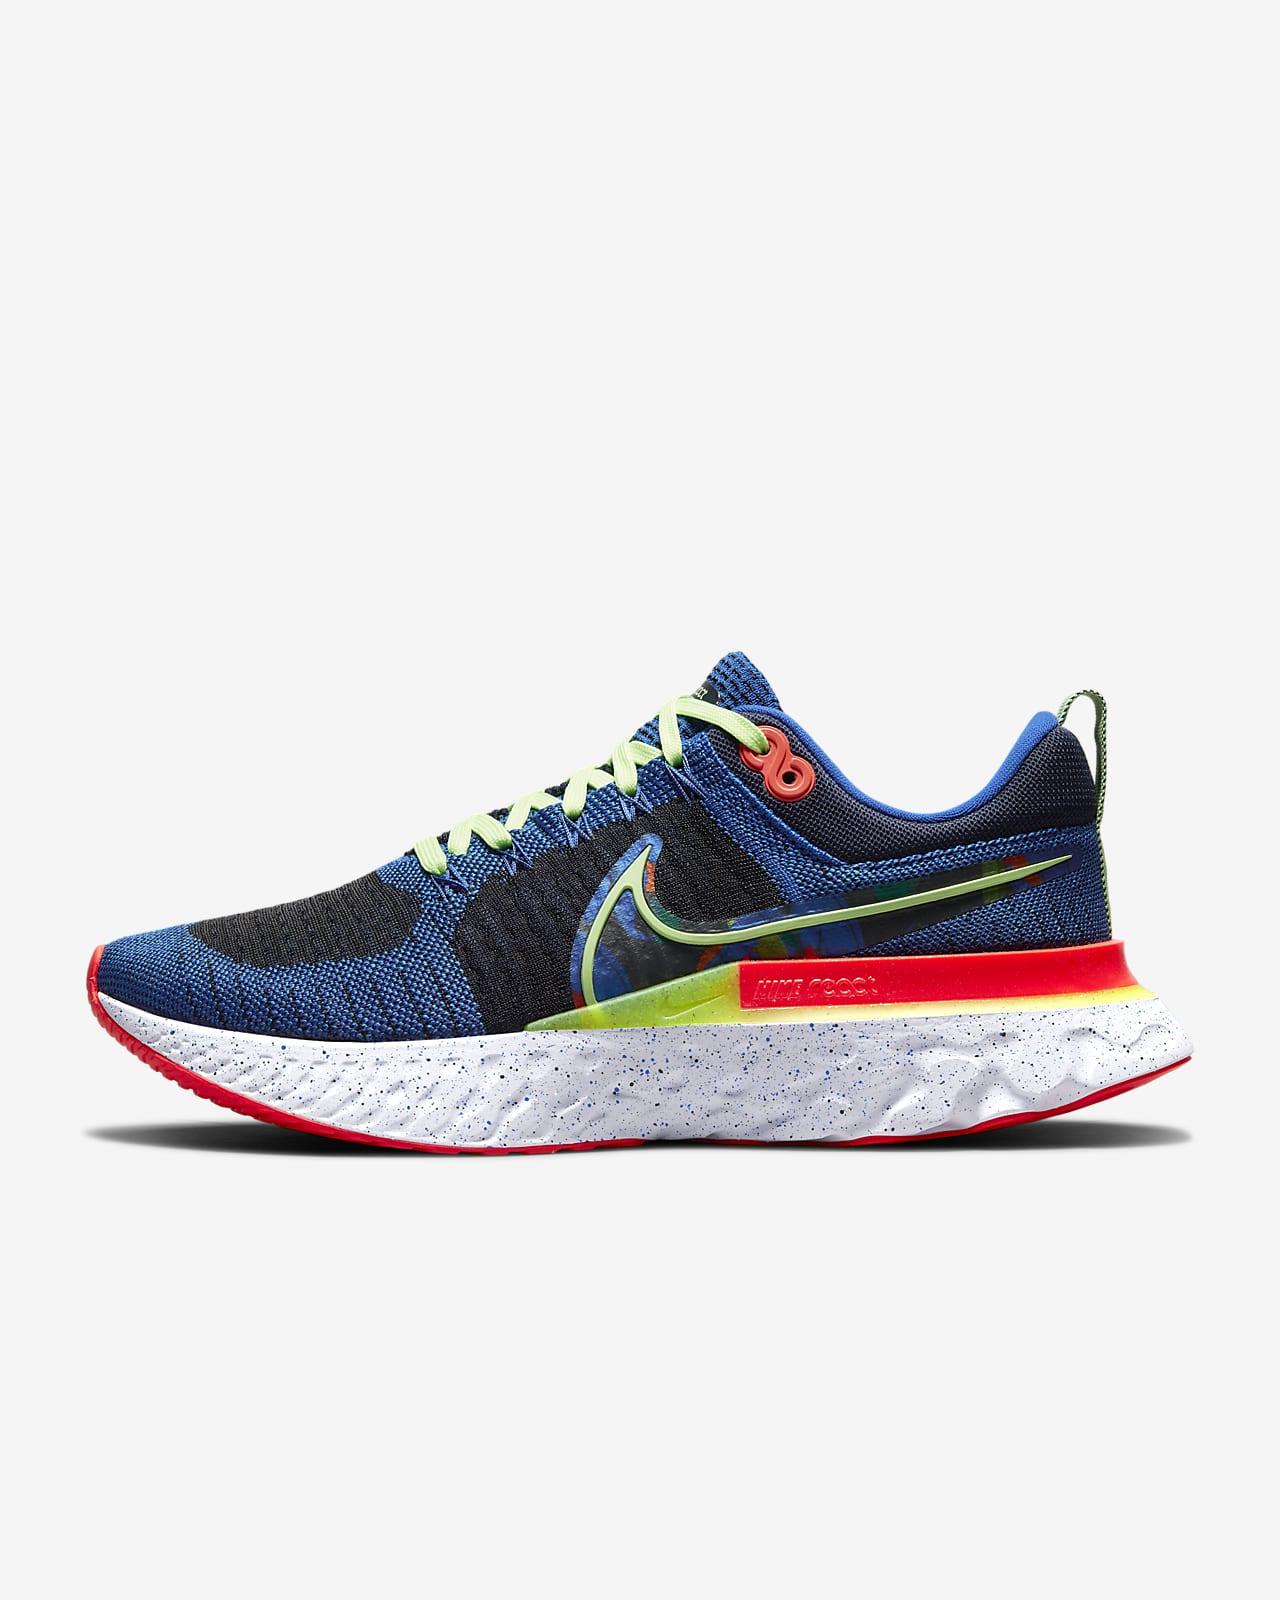 Nike React Infinity Run Flyknit 2 A.I.R. Kelly Anna London Erkek Koşu Ayakkabısı